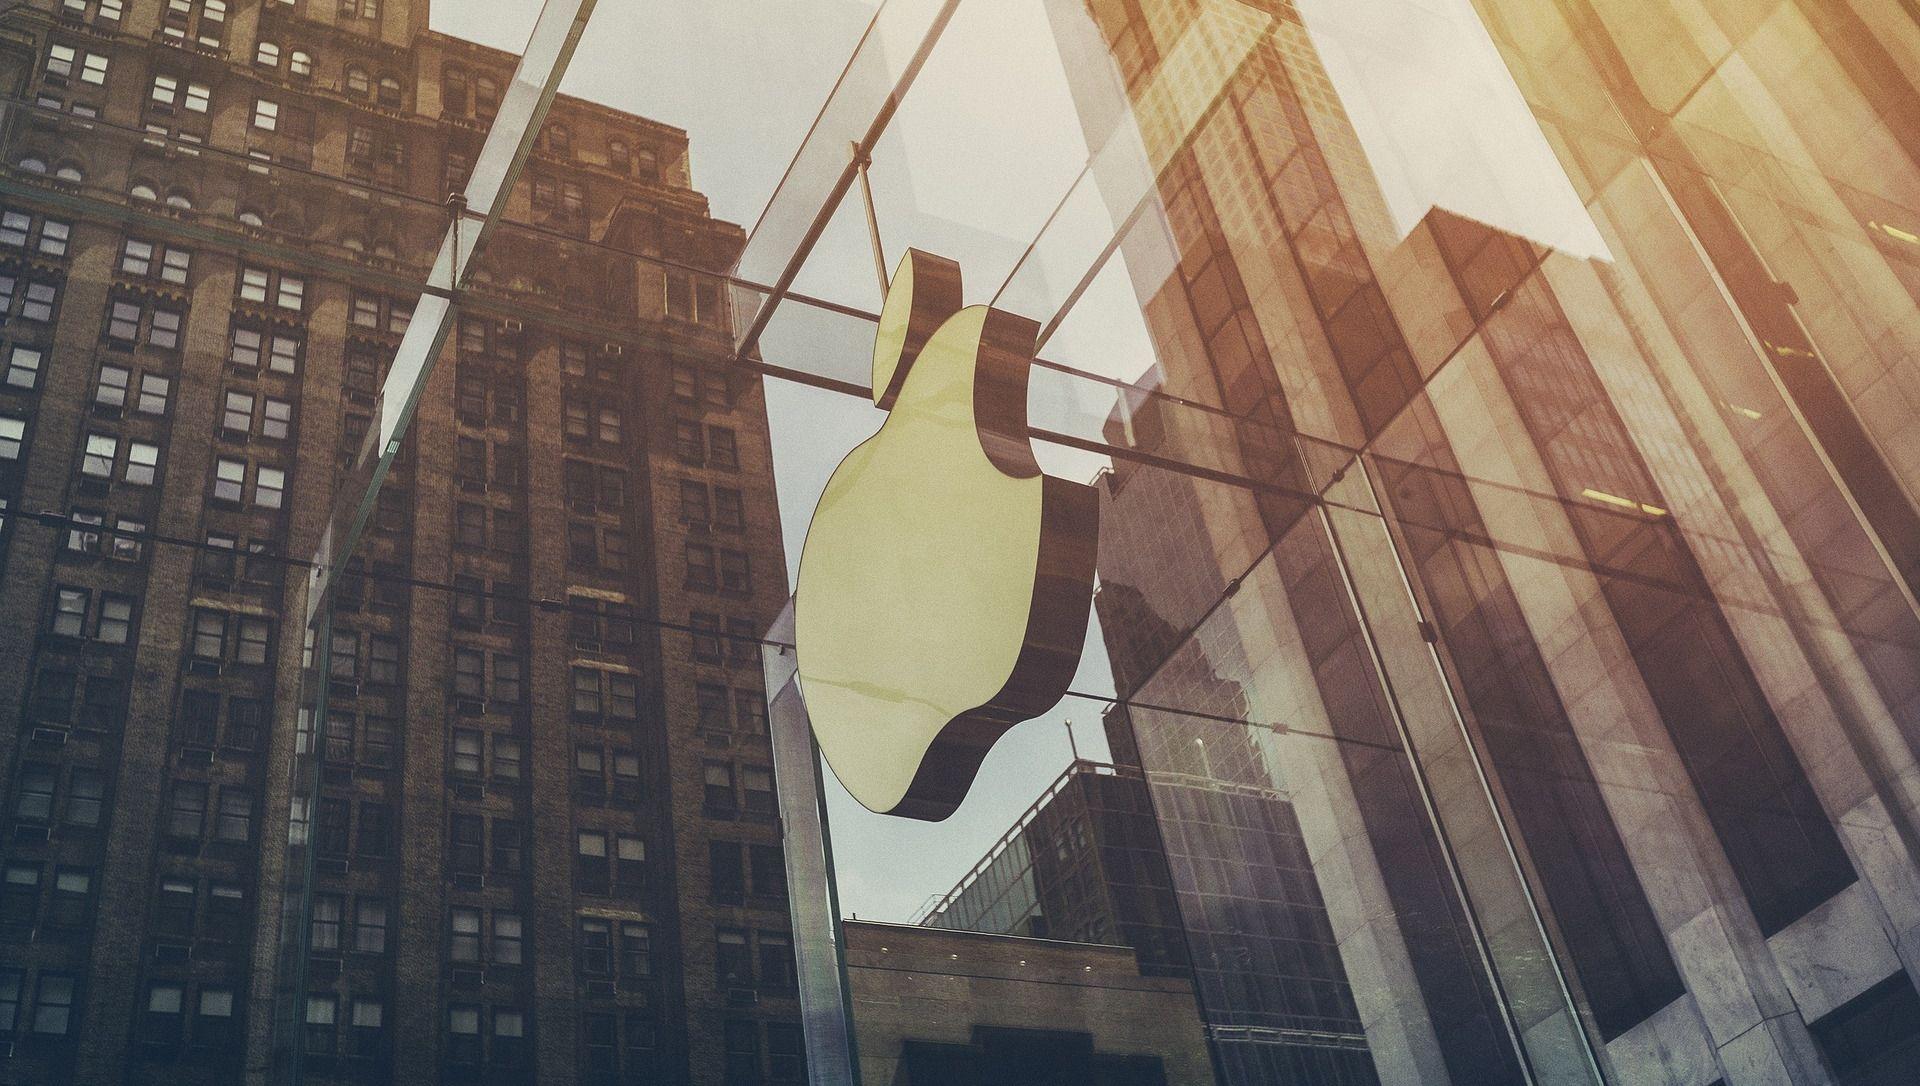 Prihodi i dobit Applea porasli po dvoznamenkastim stopama